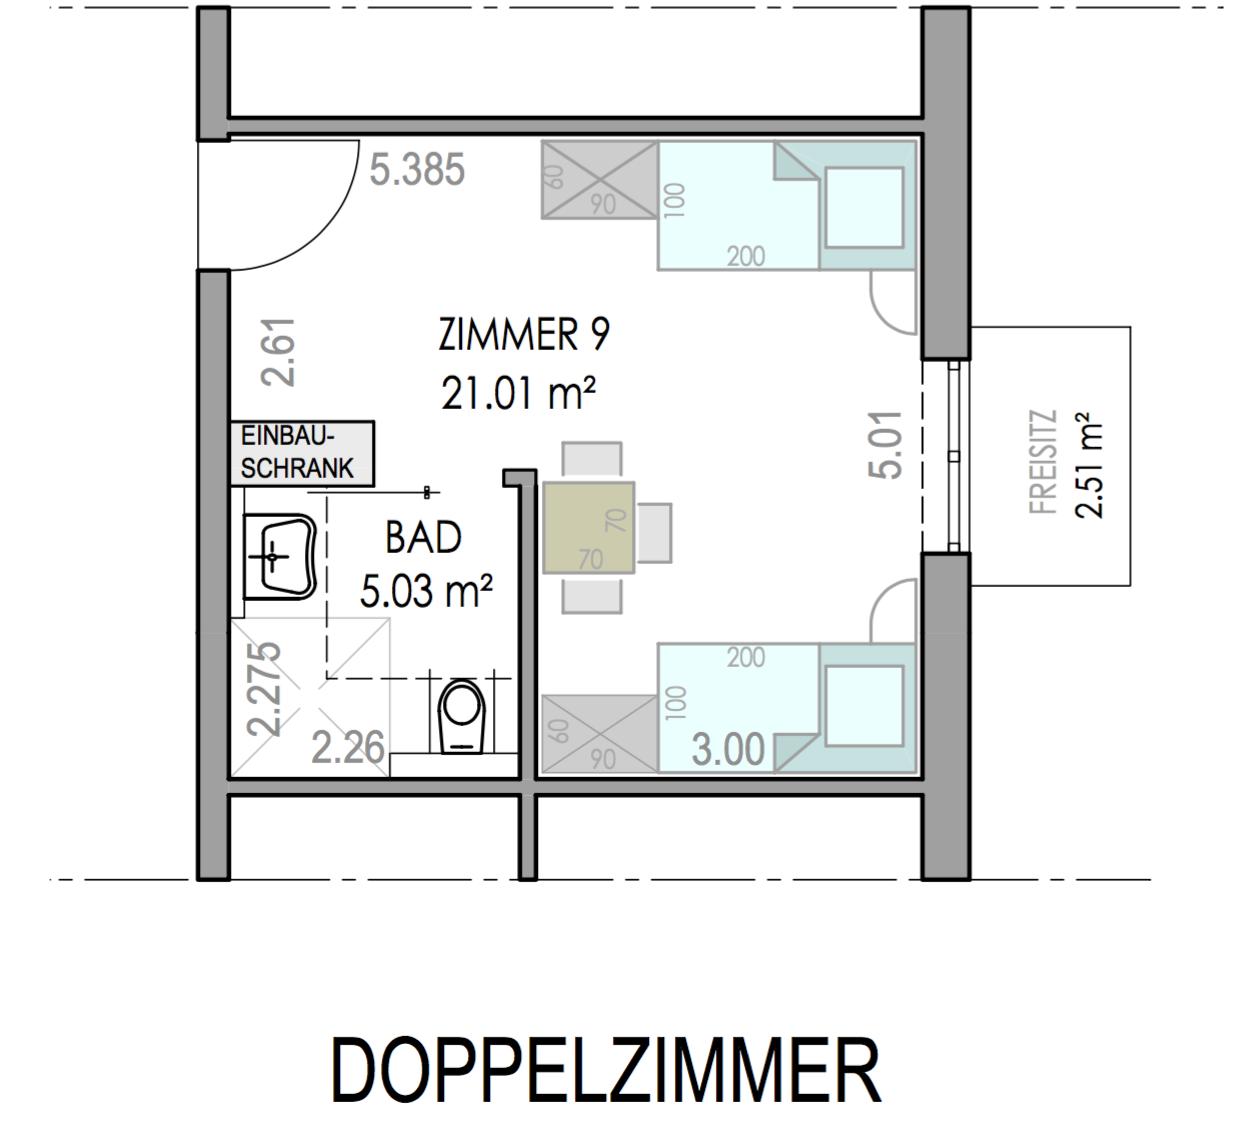 Doppel-Zimmer